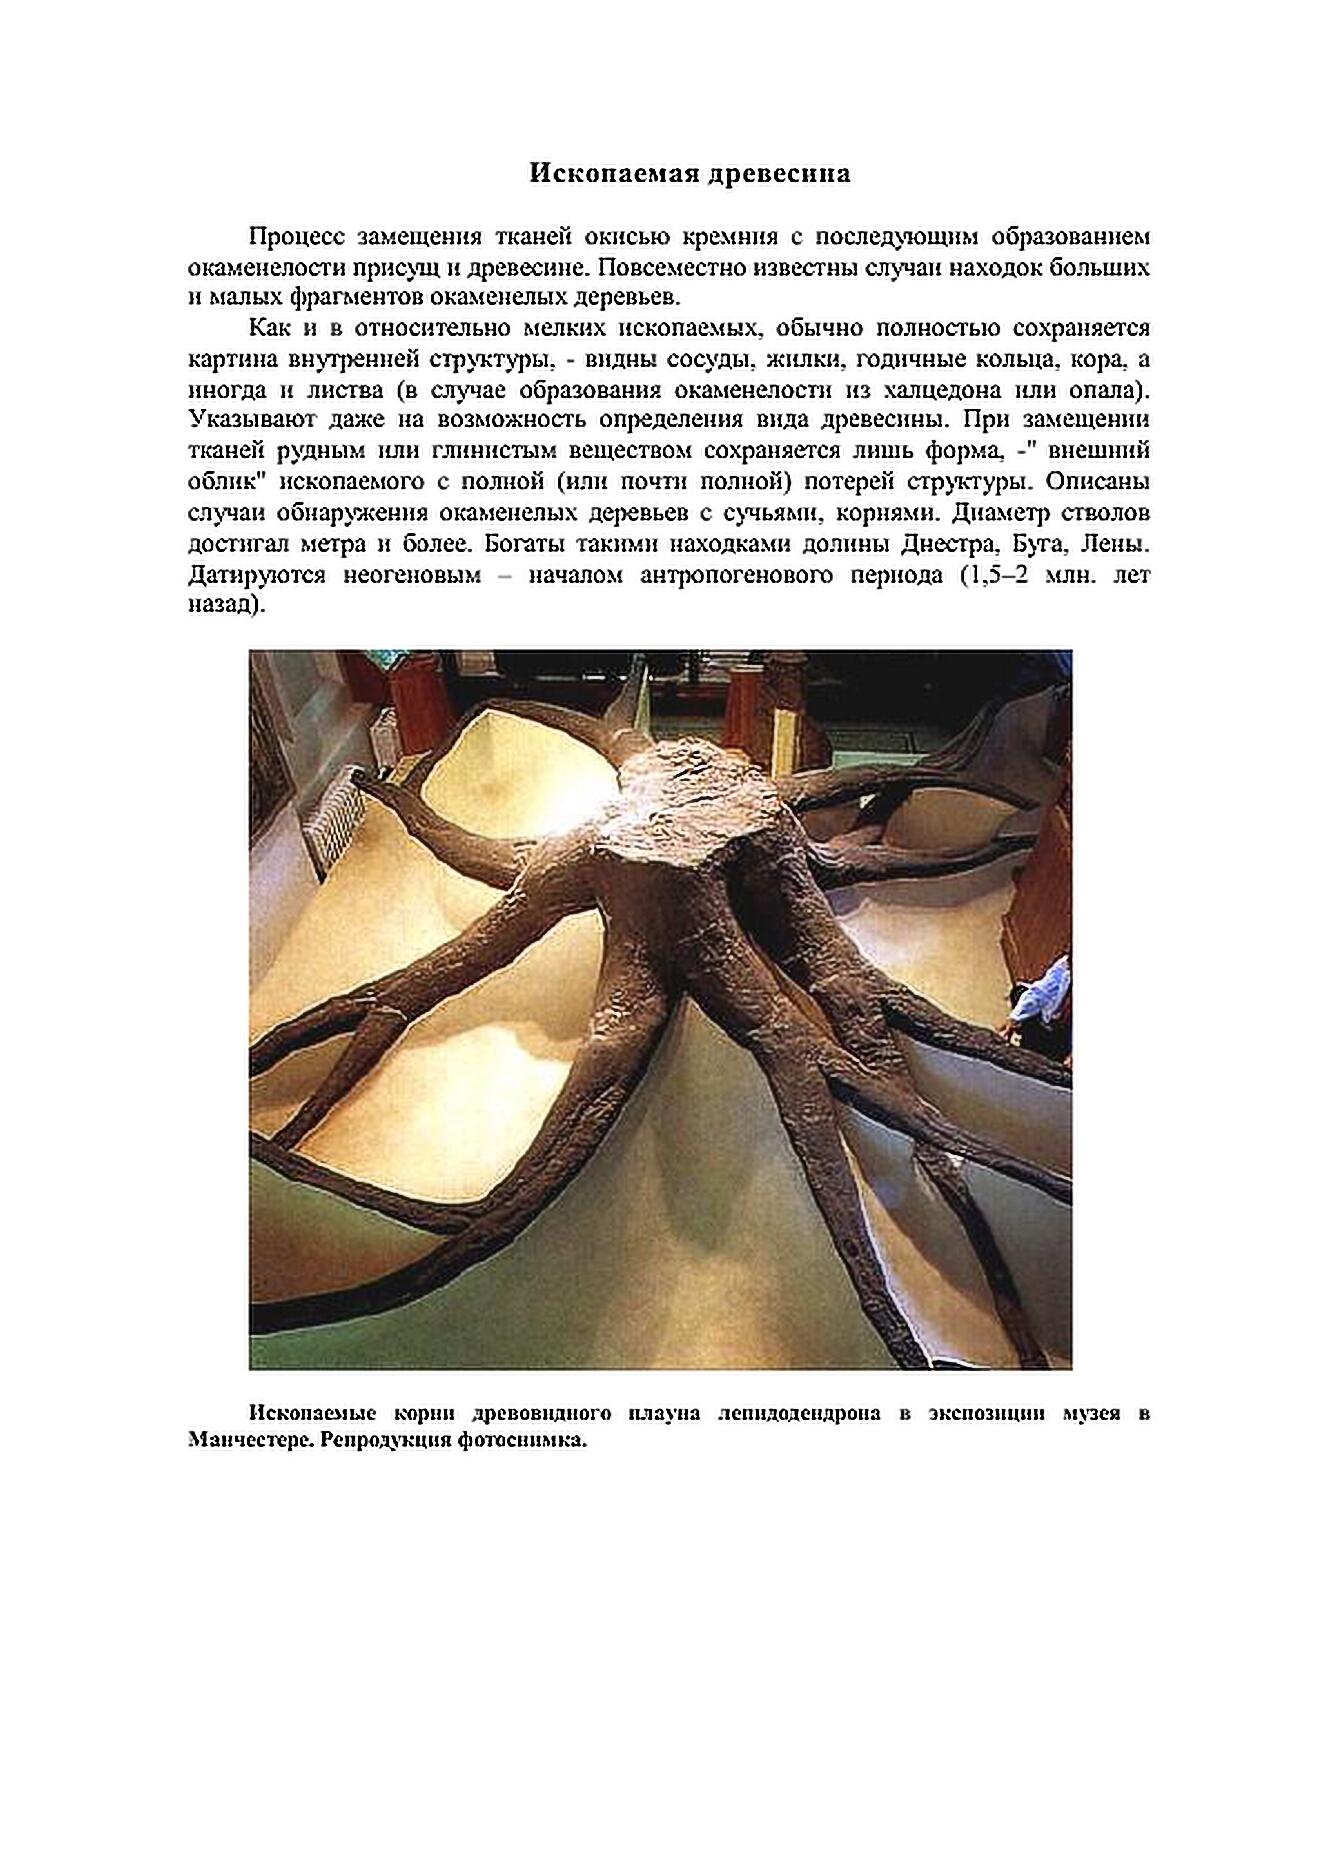 http://s5.uploads.ru/wXURd.jpg